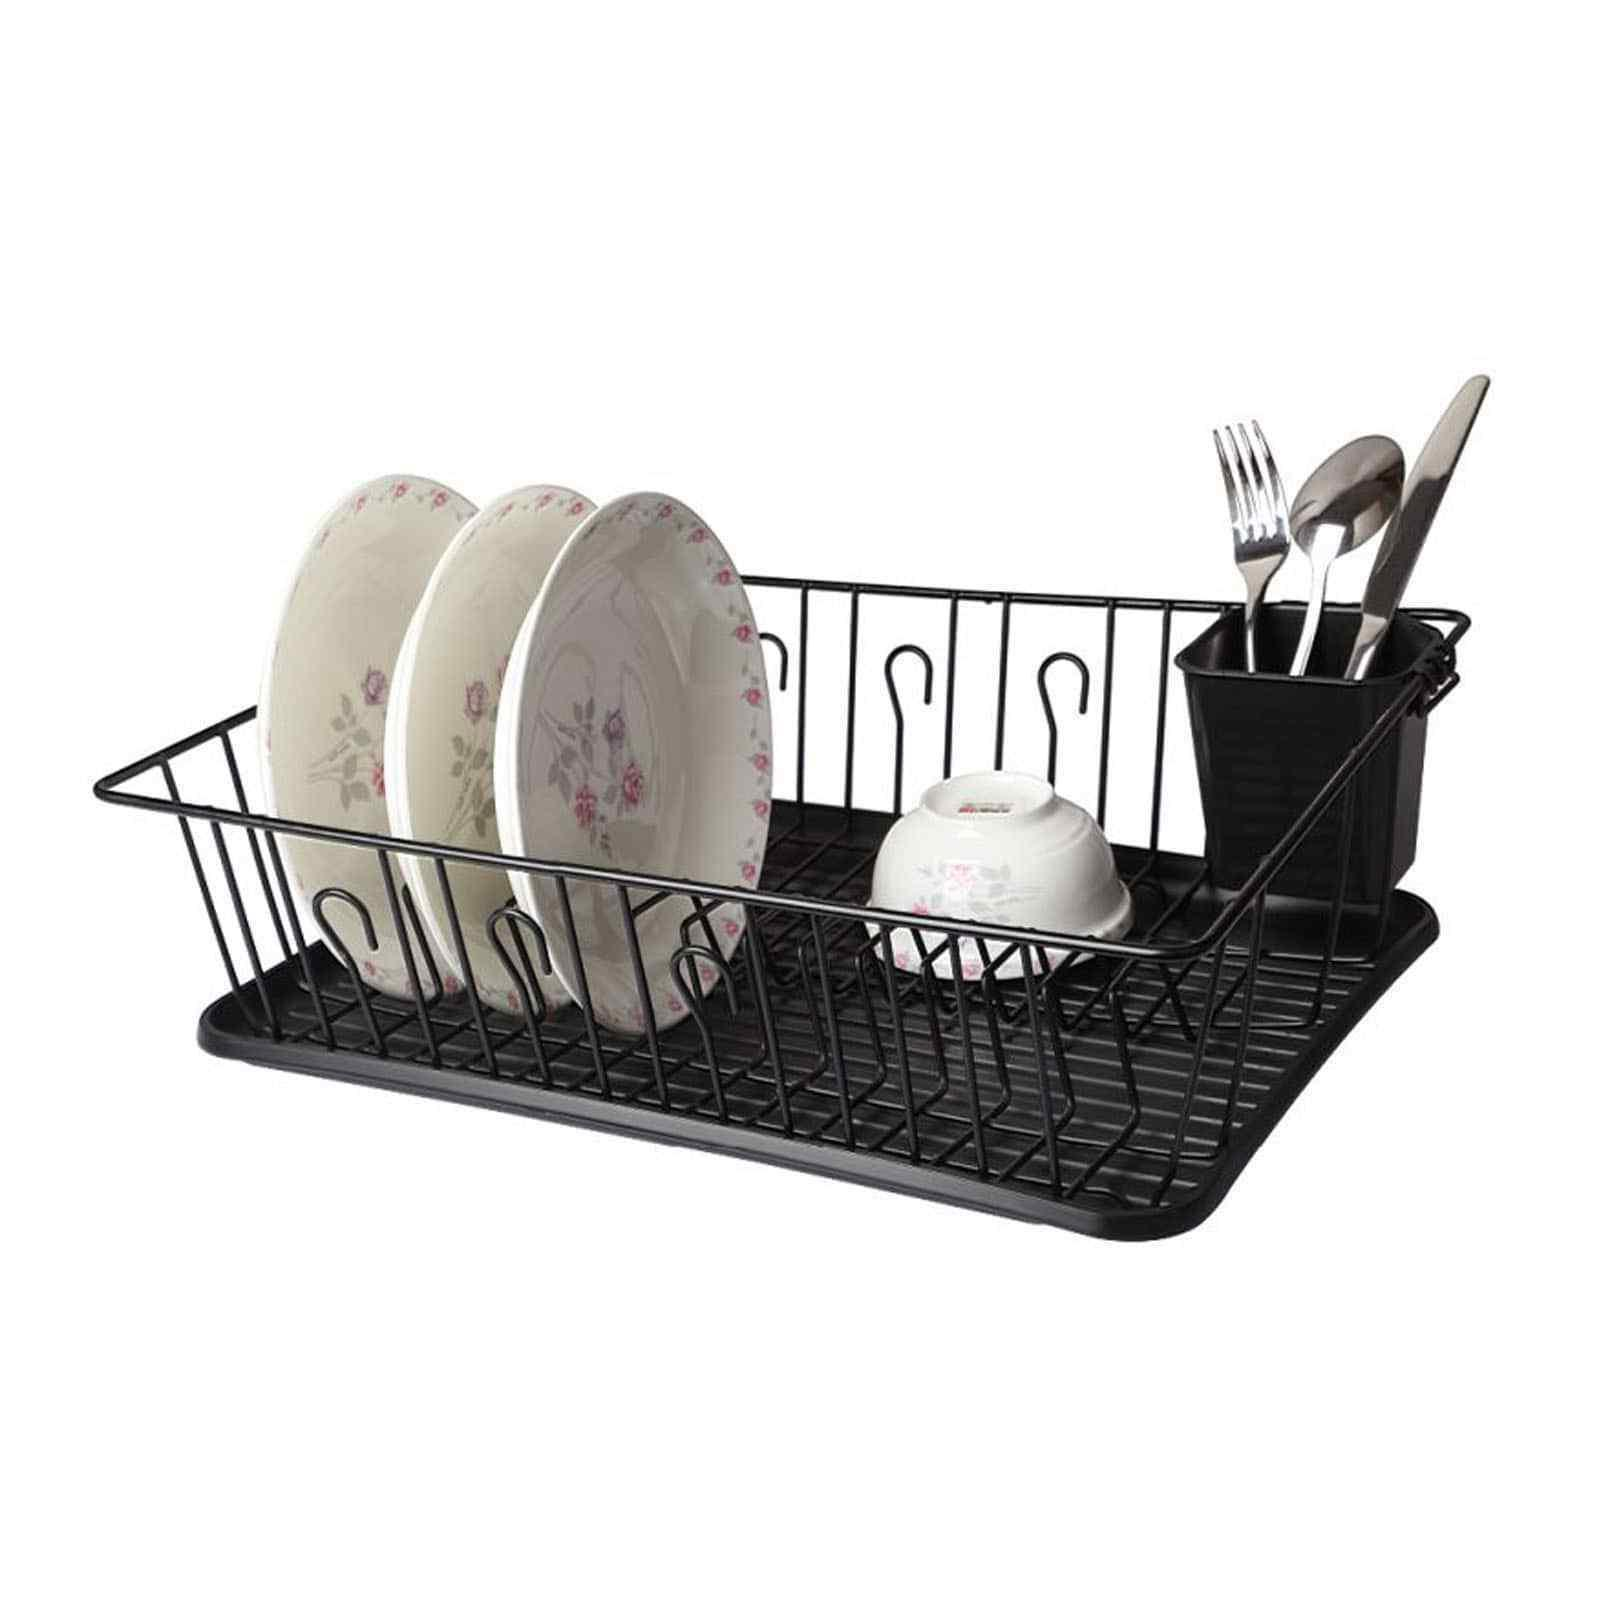 Stylish Sturdy Stainless Steel Wire Medium Dish Drainer Dryi